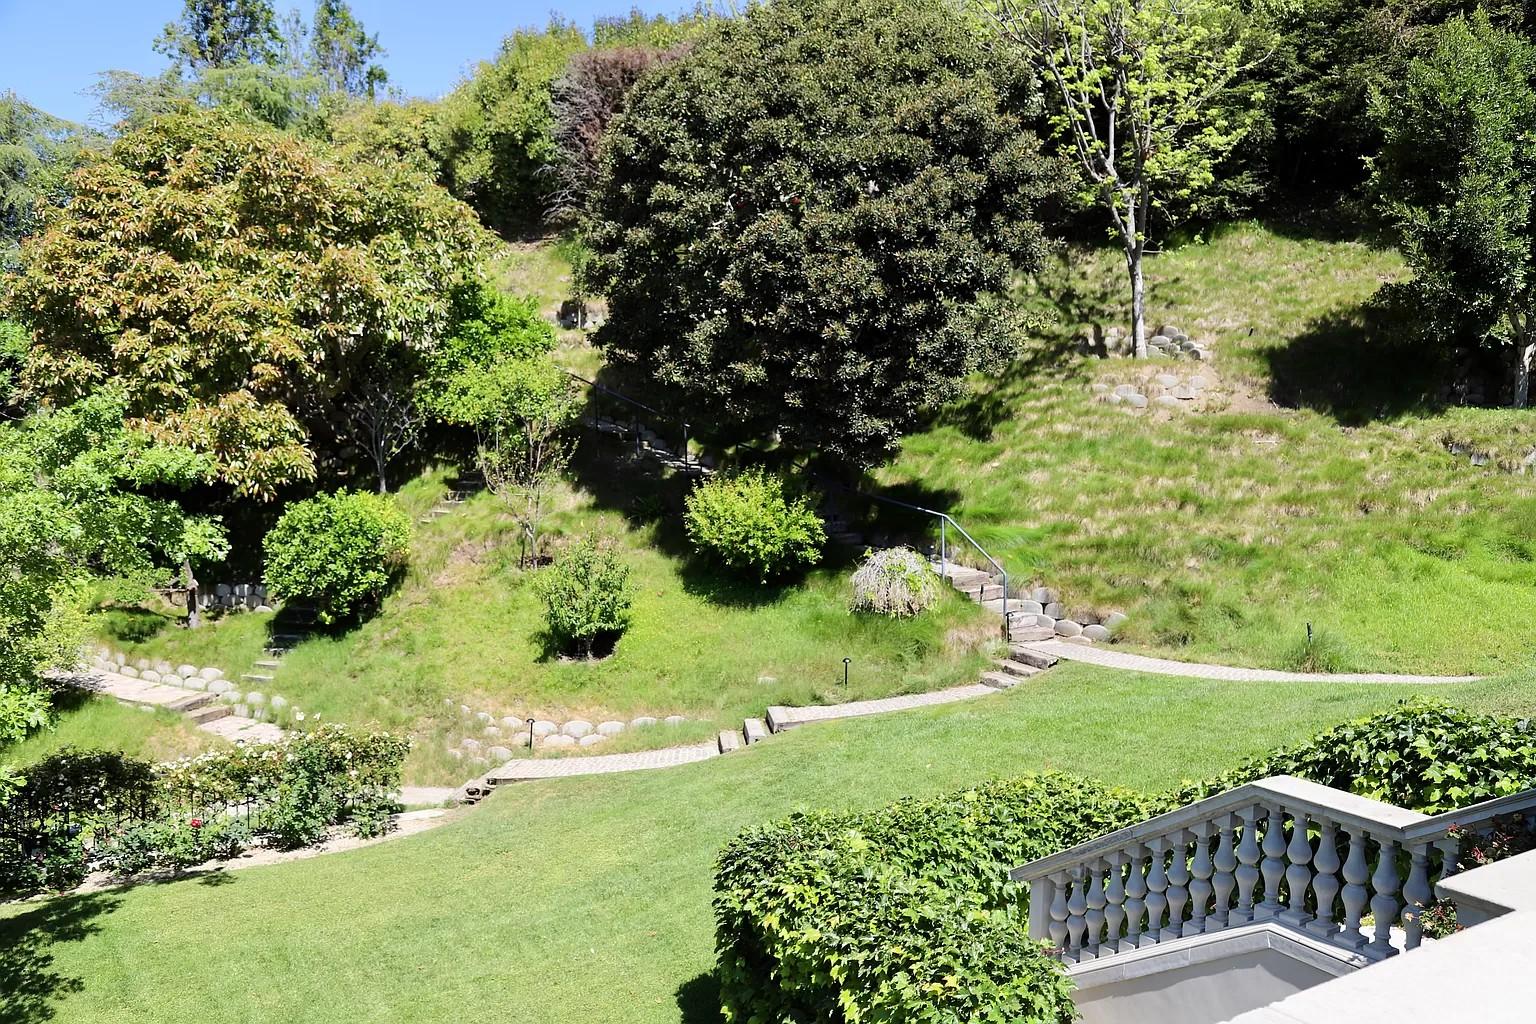 Backyard hills